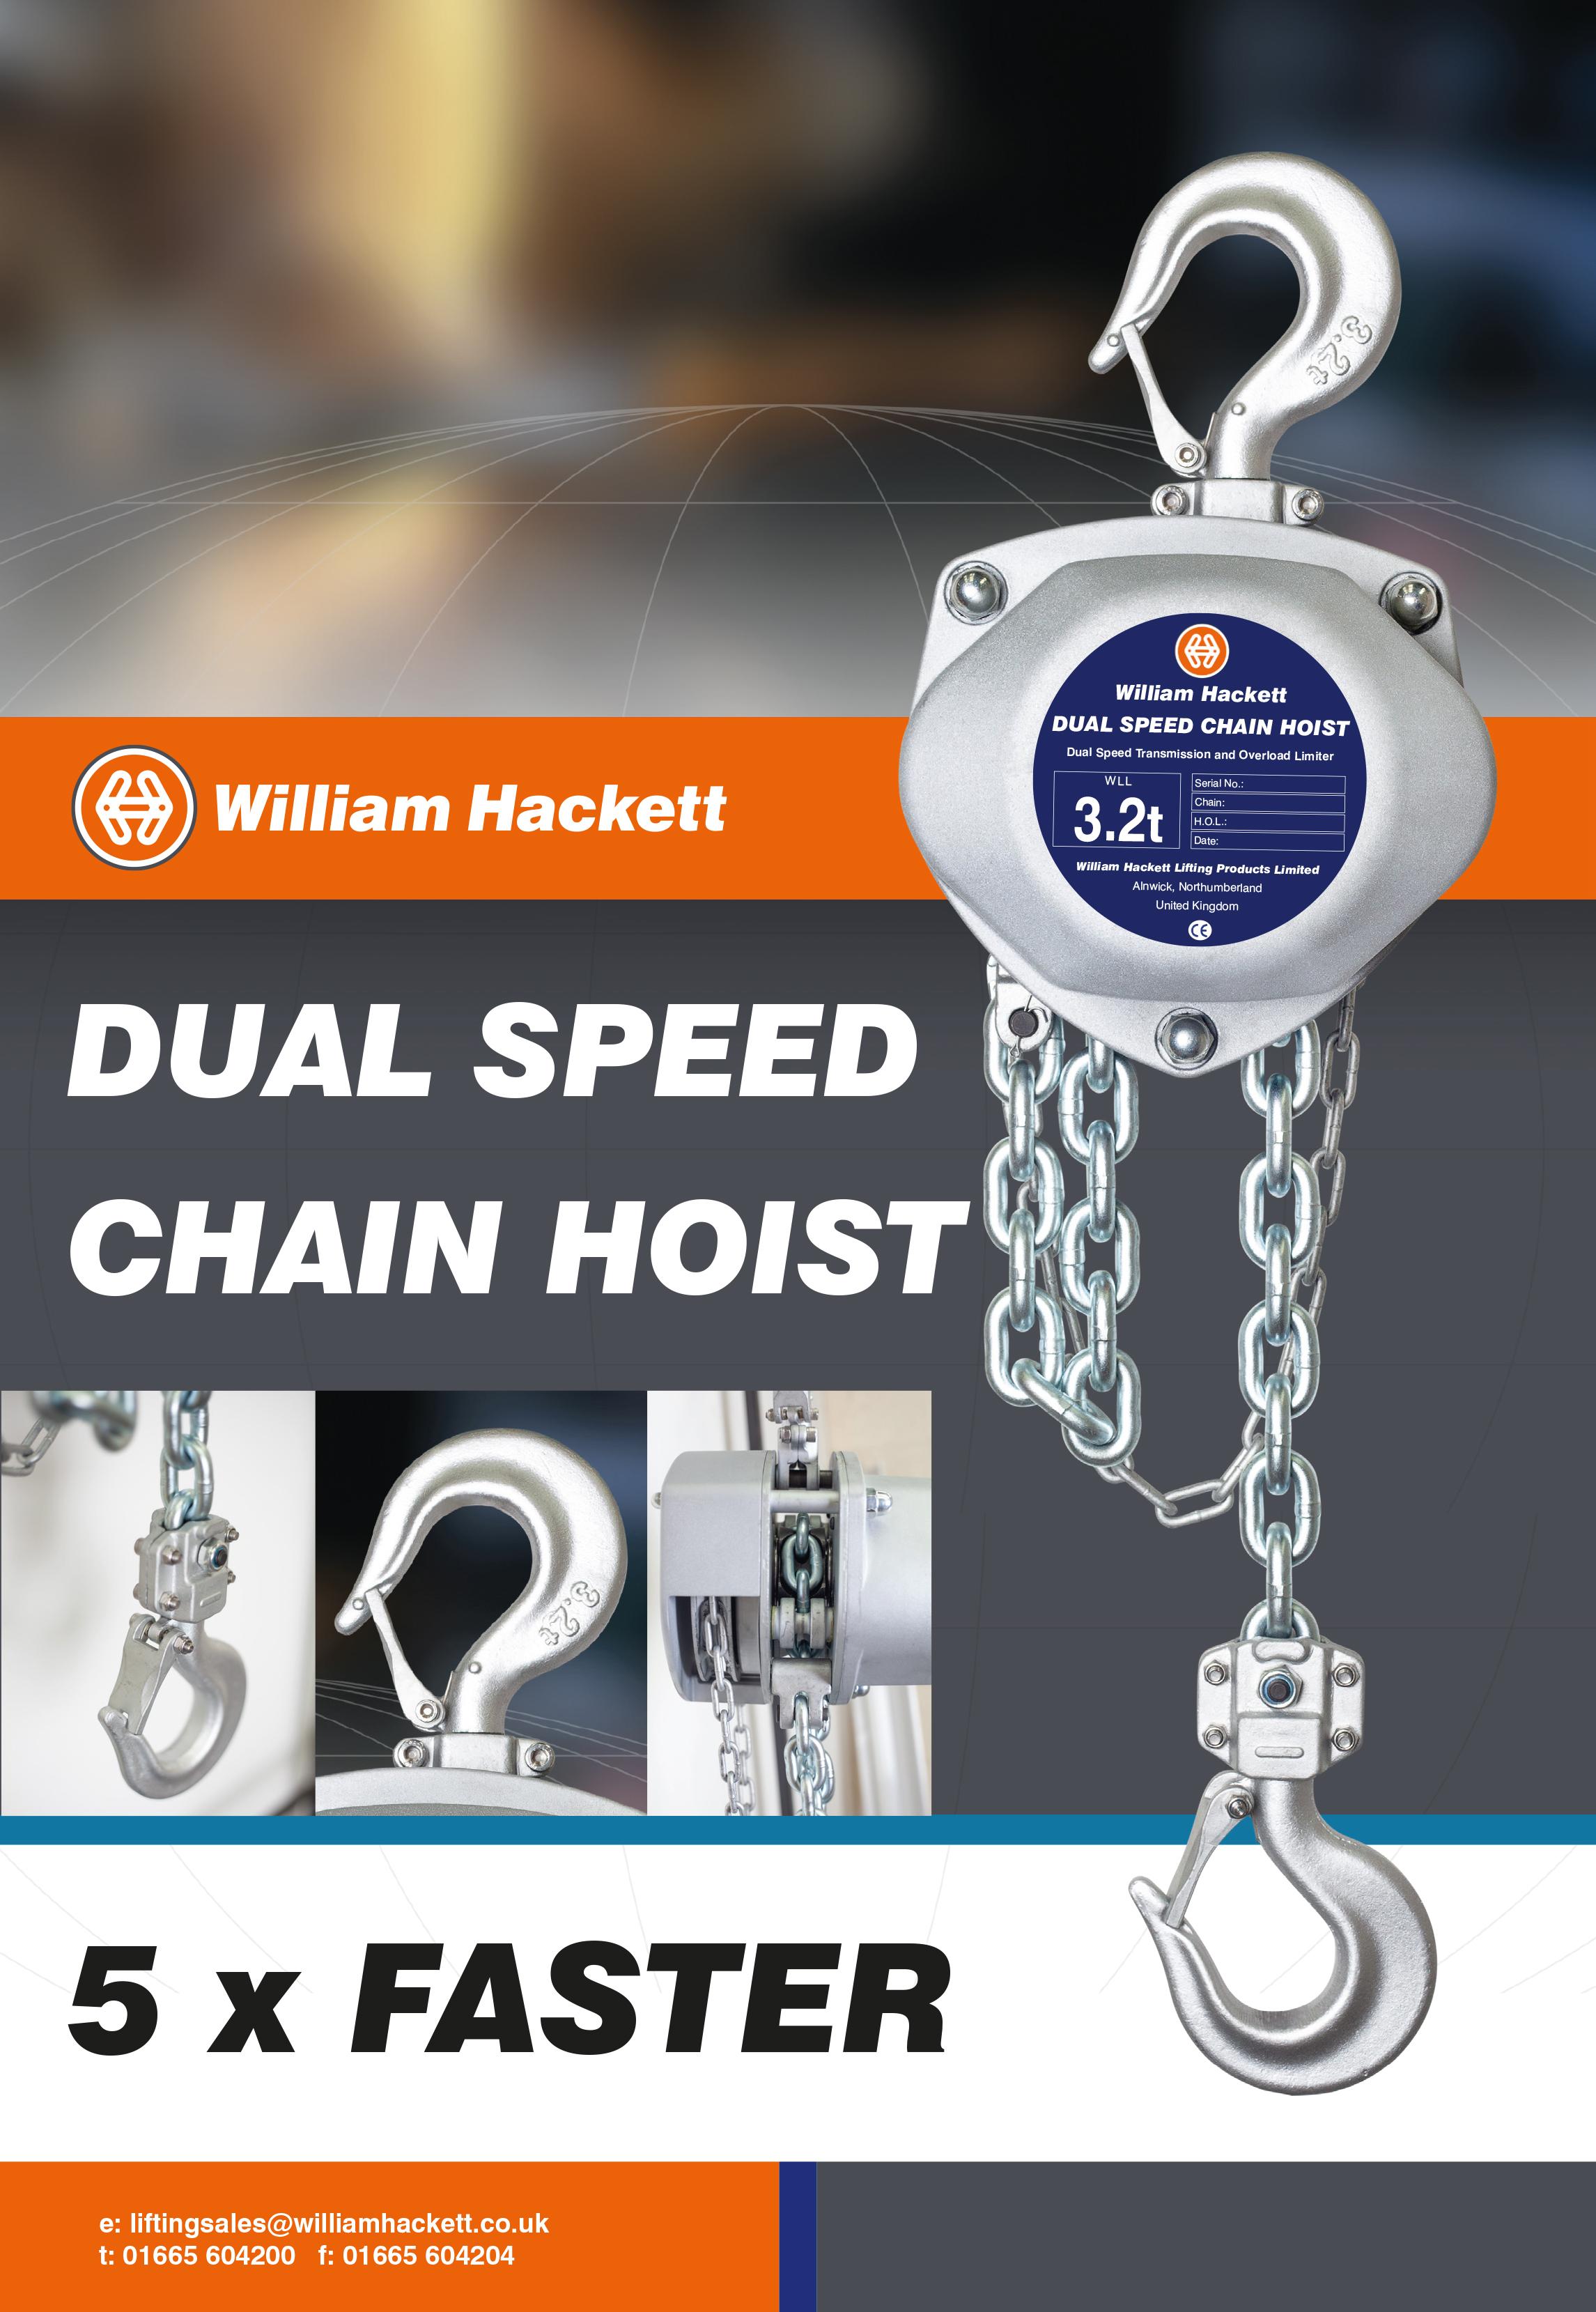 William Hackett Ltd